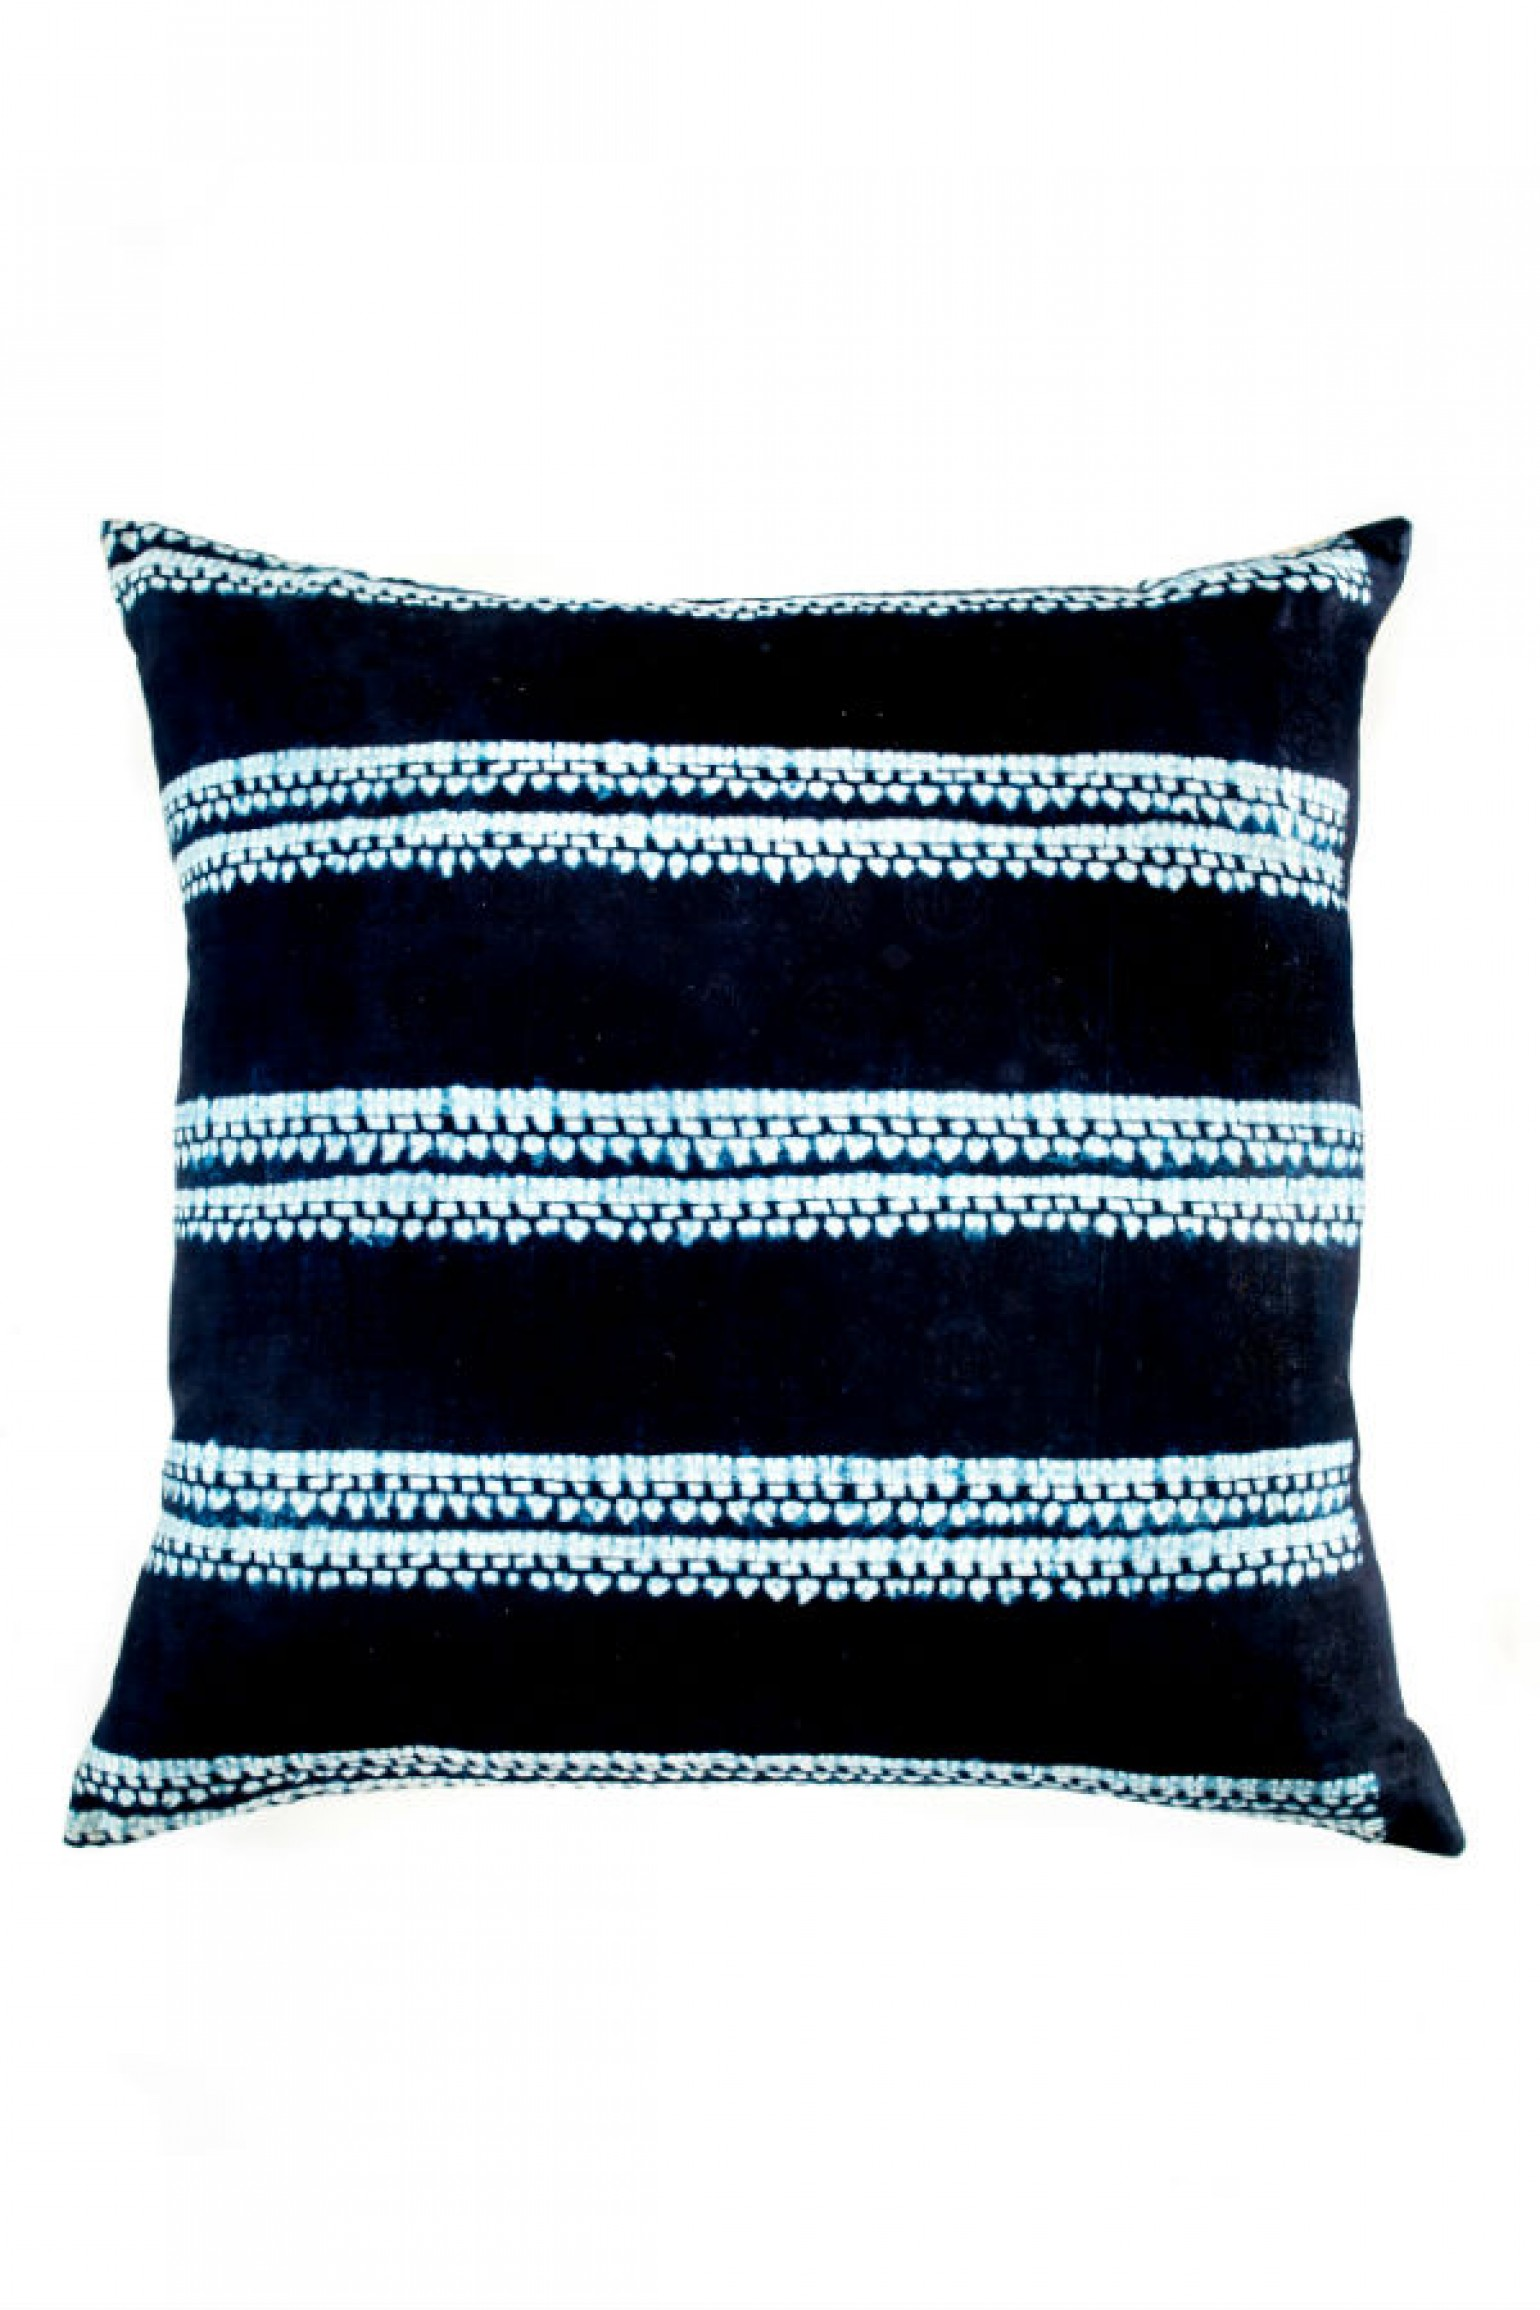 Loomware African Indigo Cloth Cushions